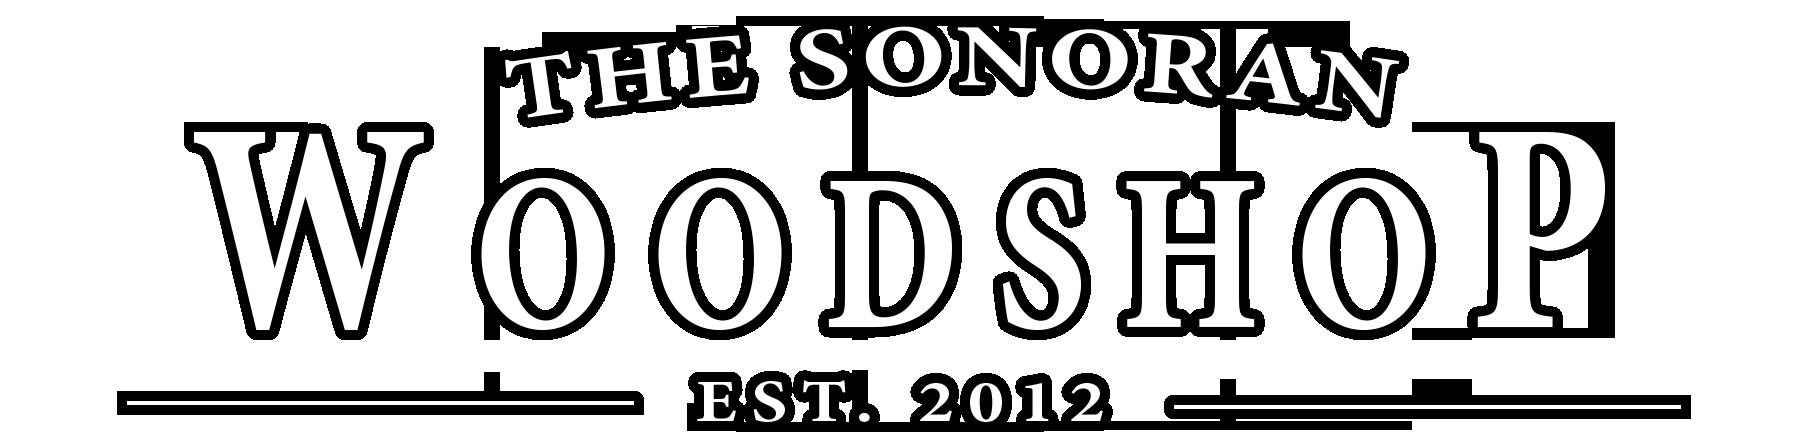 Sonoran Woodshop